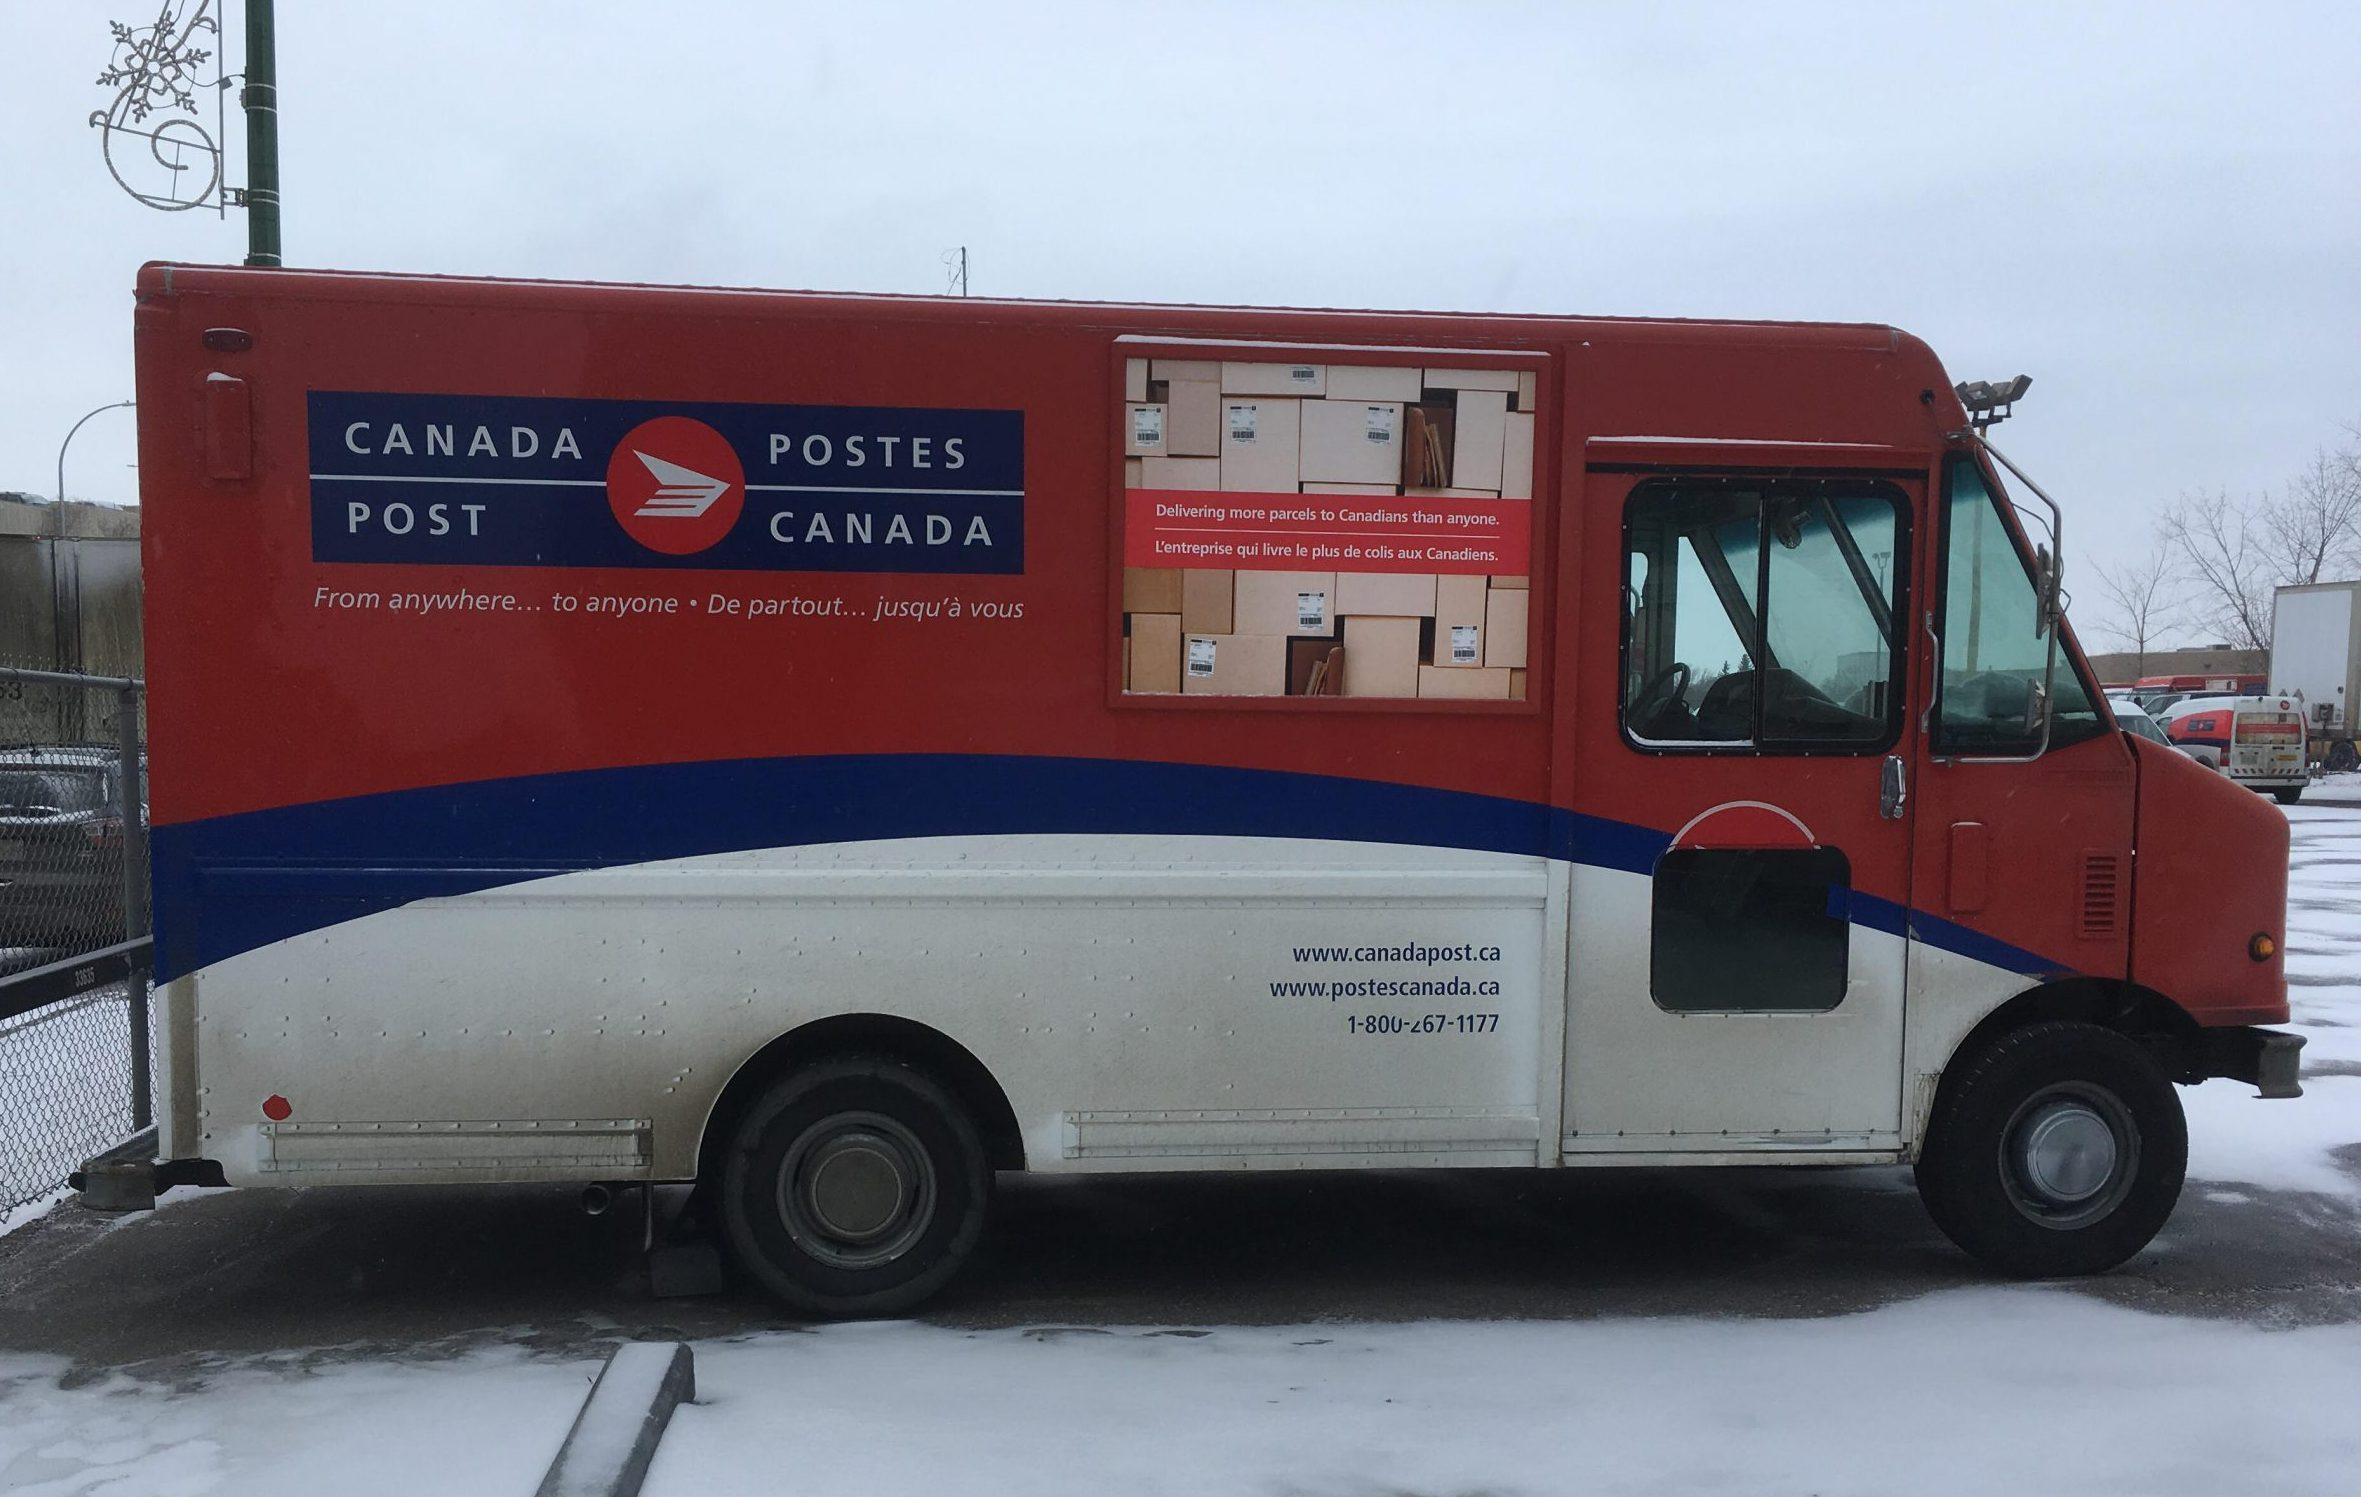 Regina Canada Post courier caper caught by cops